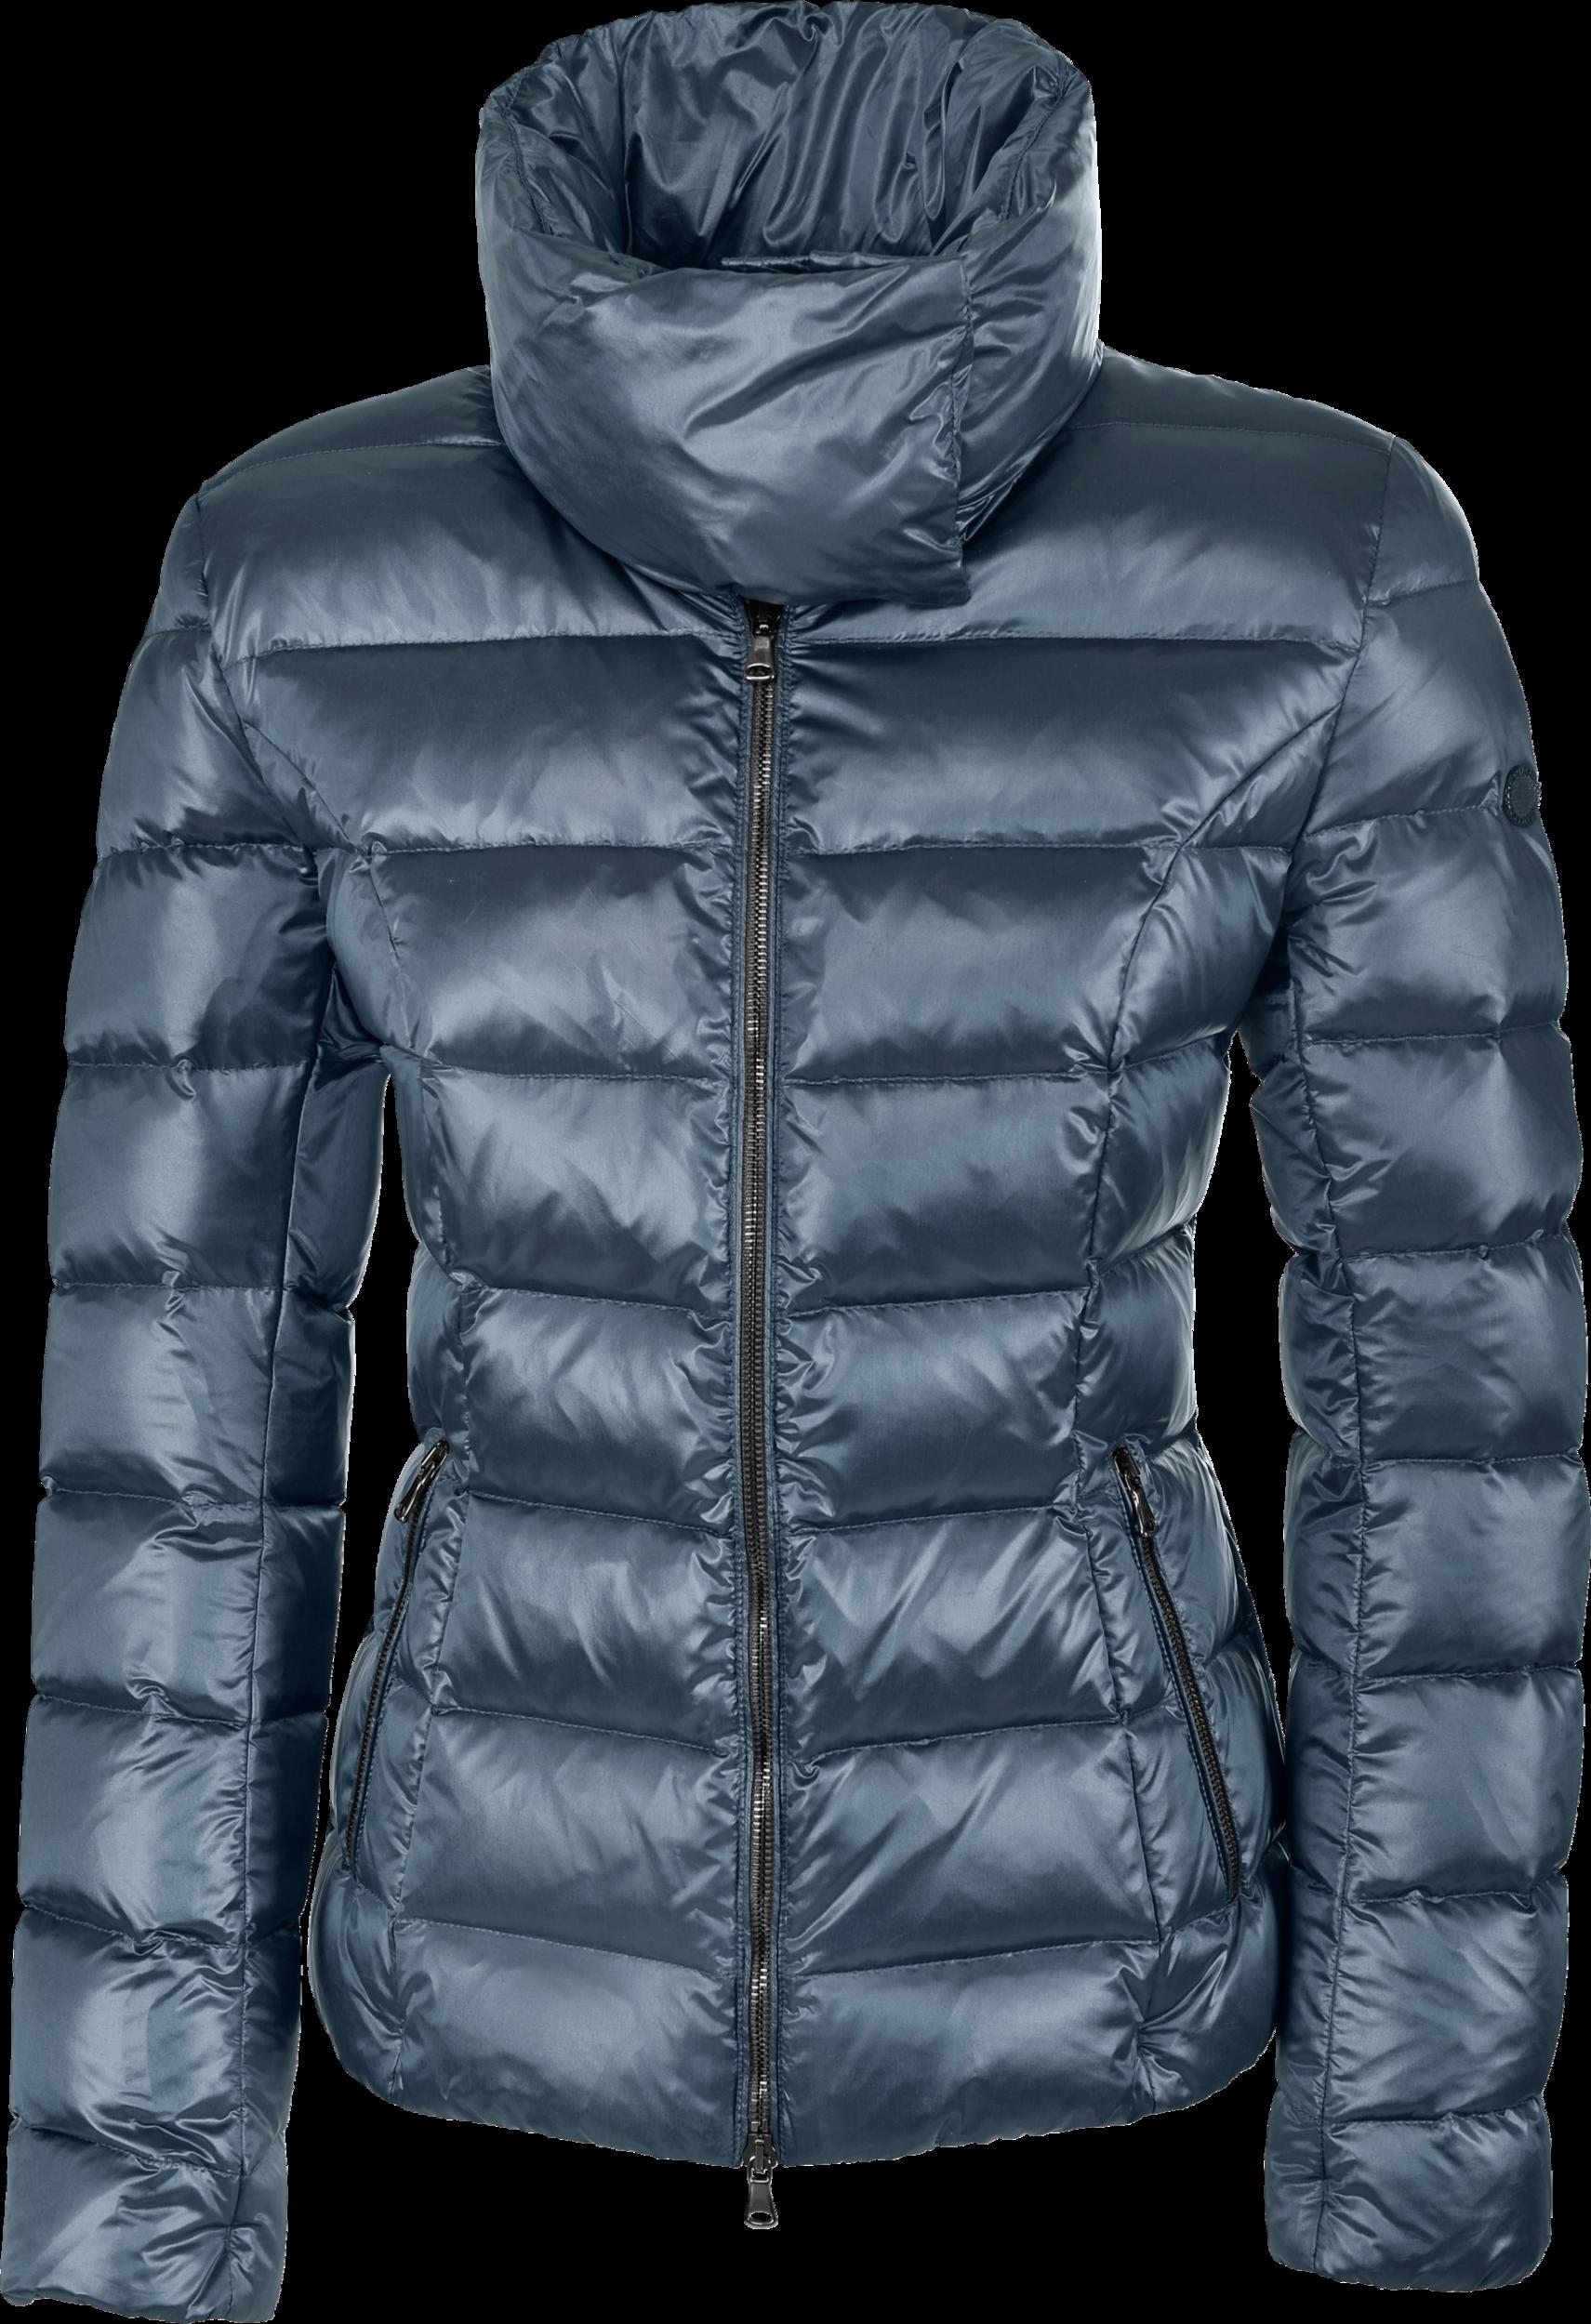 AMBER Jacket